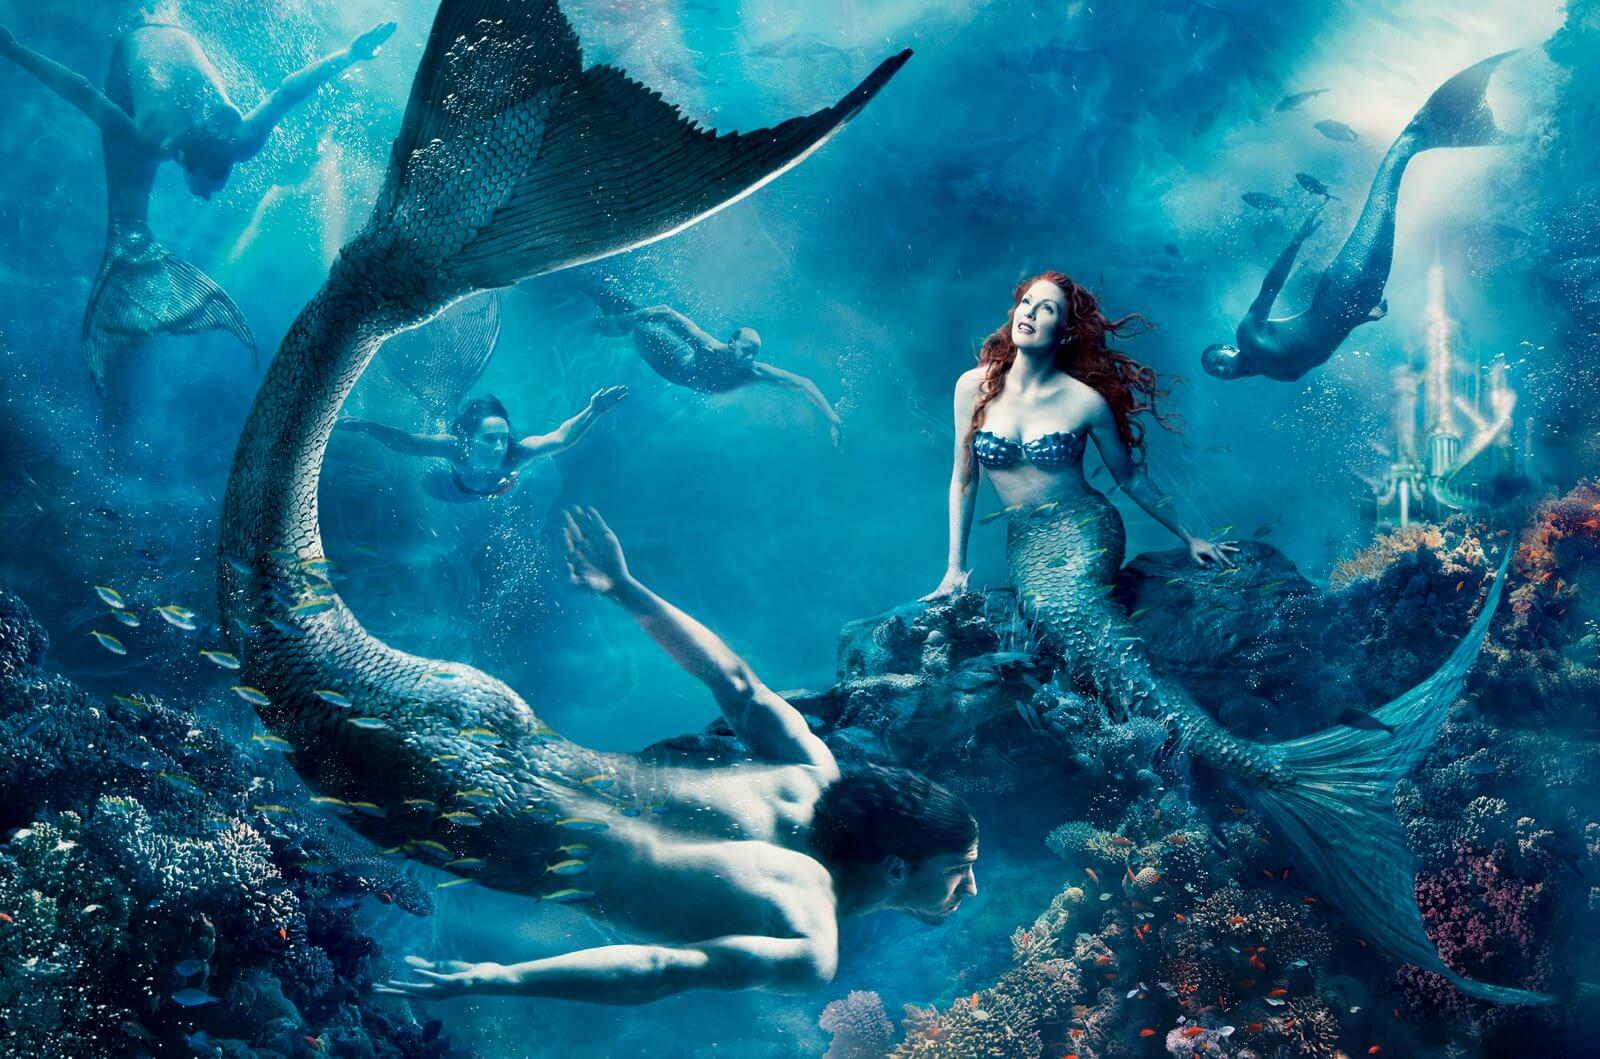 Julianna sknny nymphs erotic movies